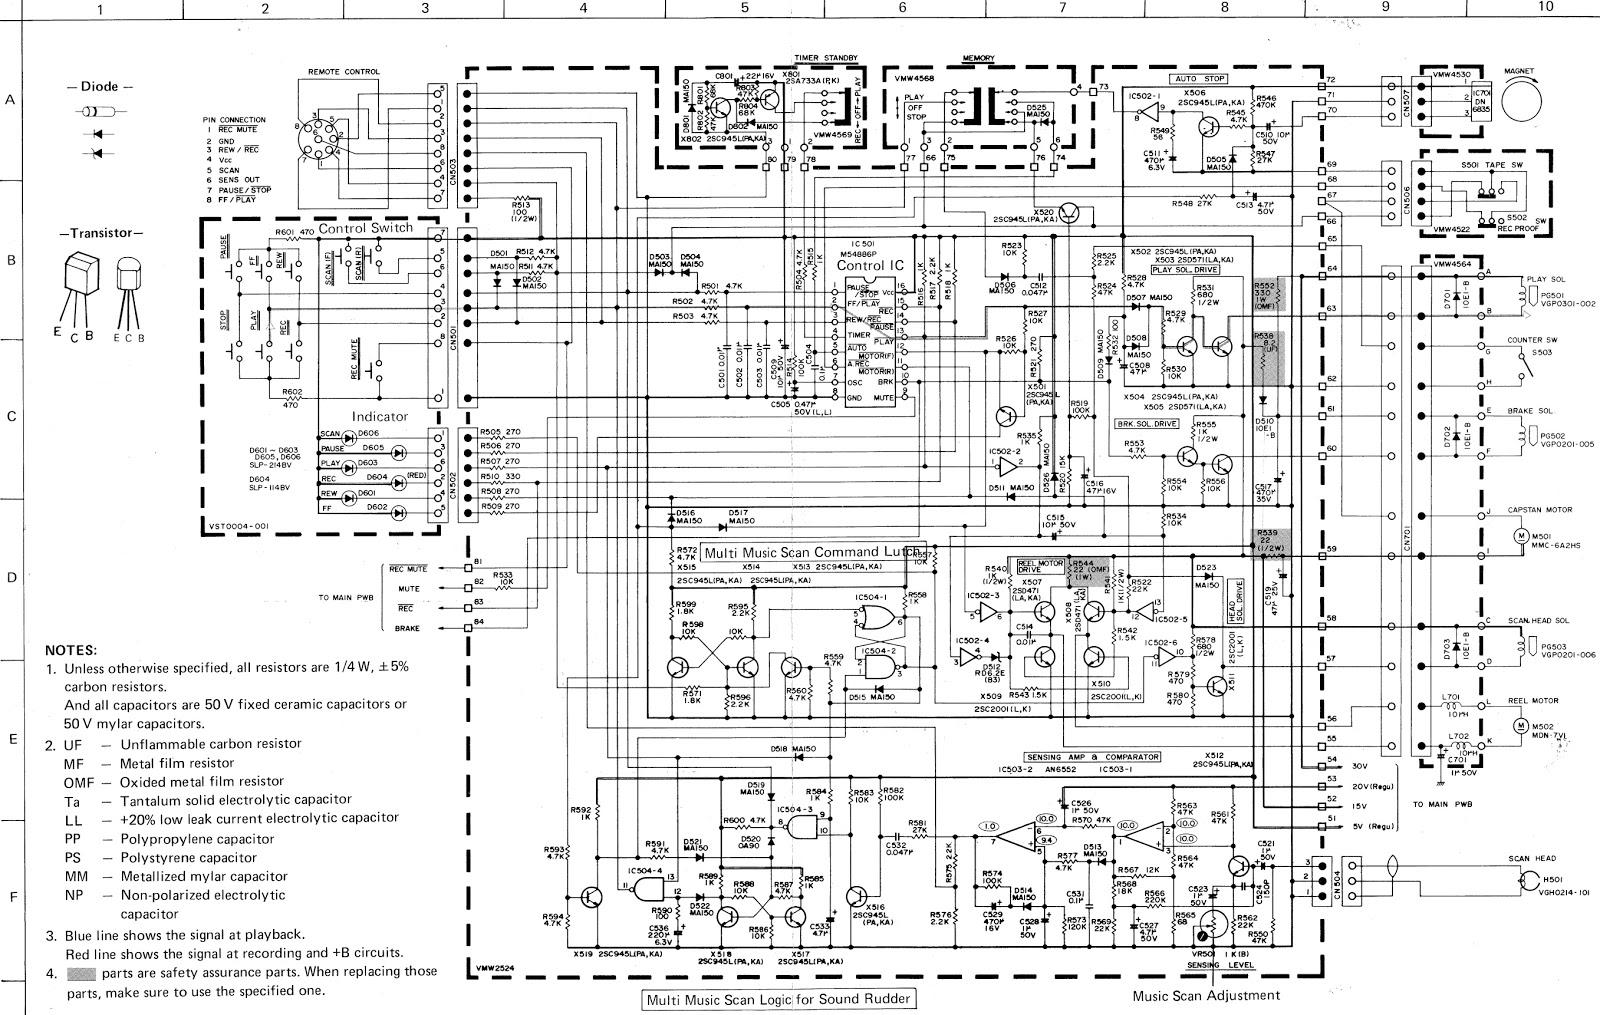 JVC KD A55  Gradient CD6500  Tape deck  Circuit Diagram